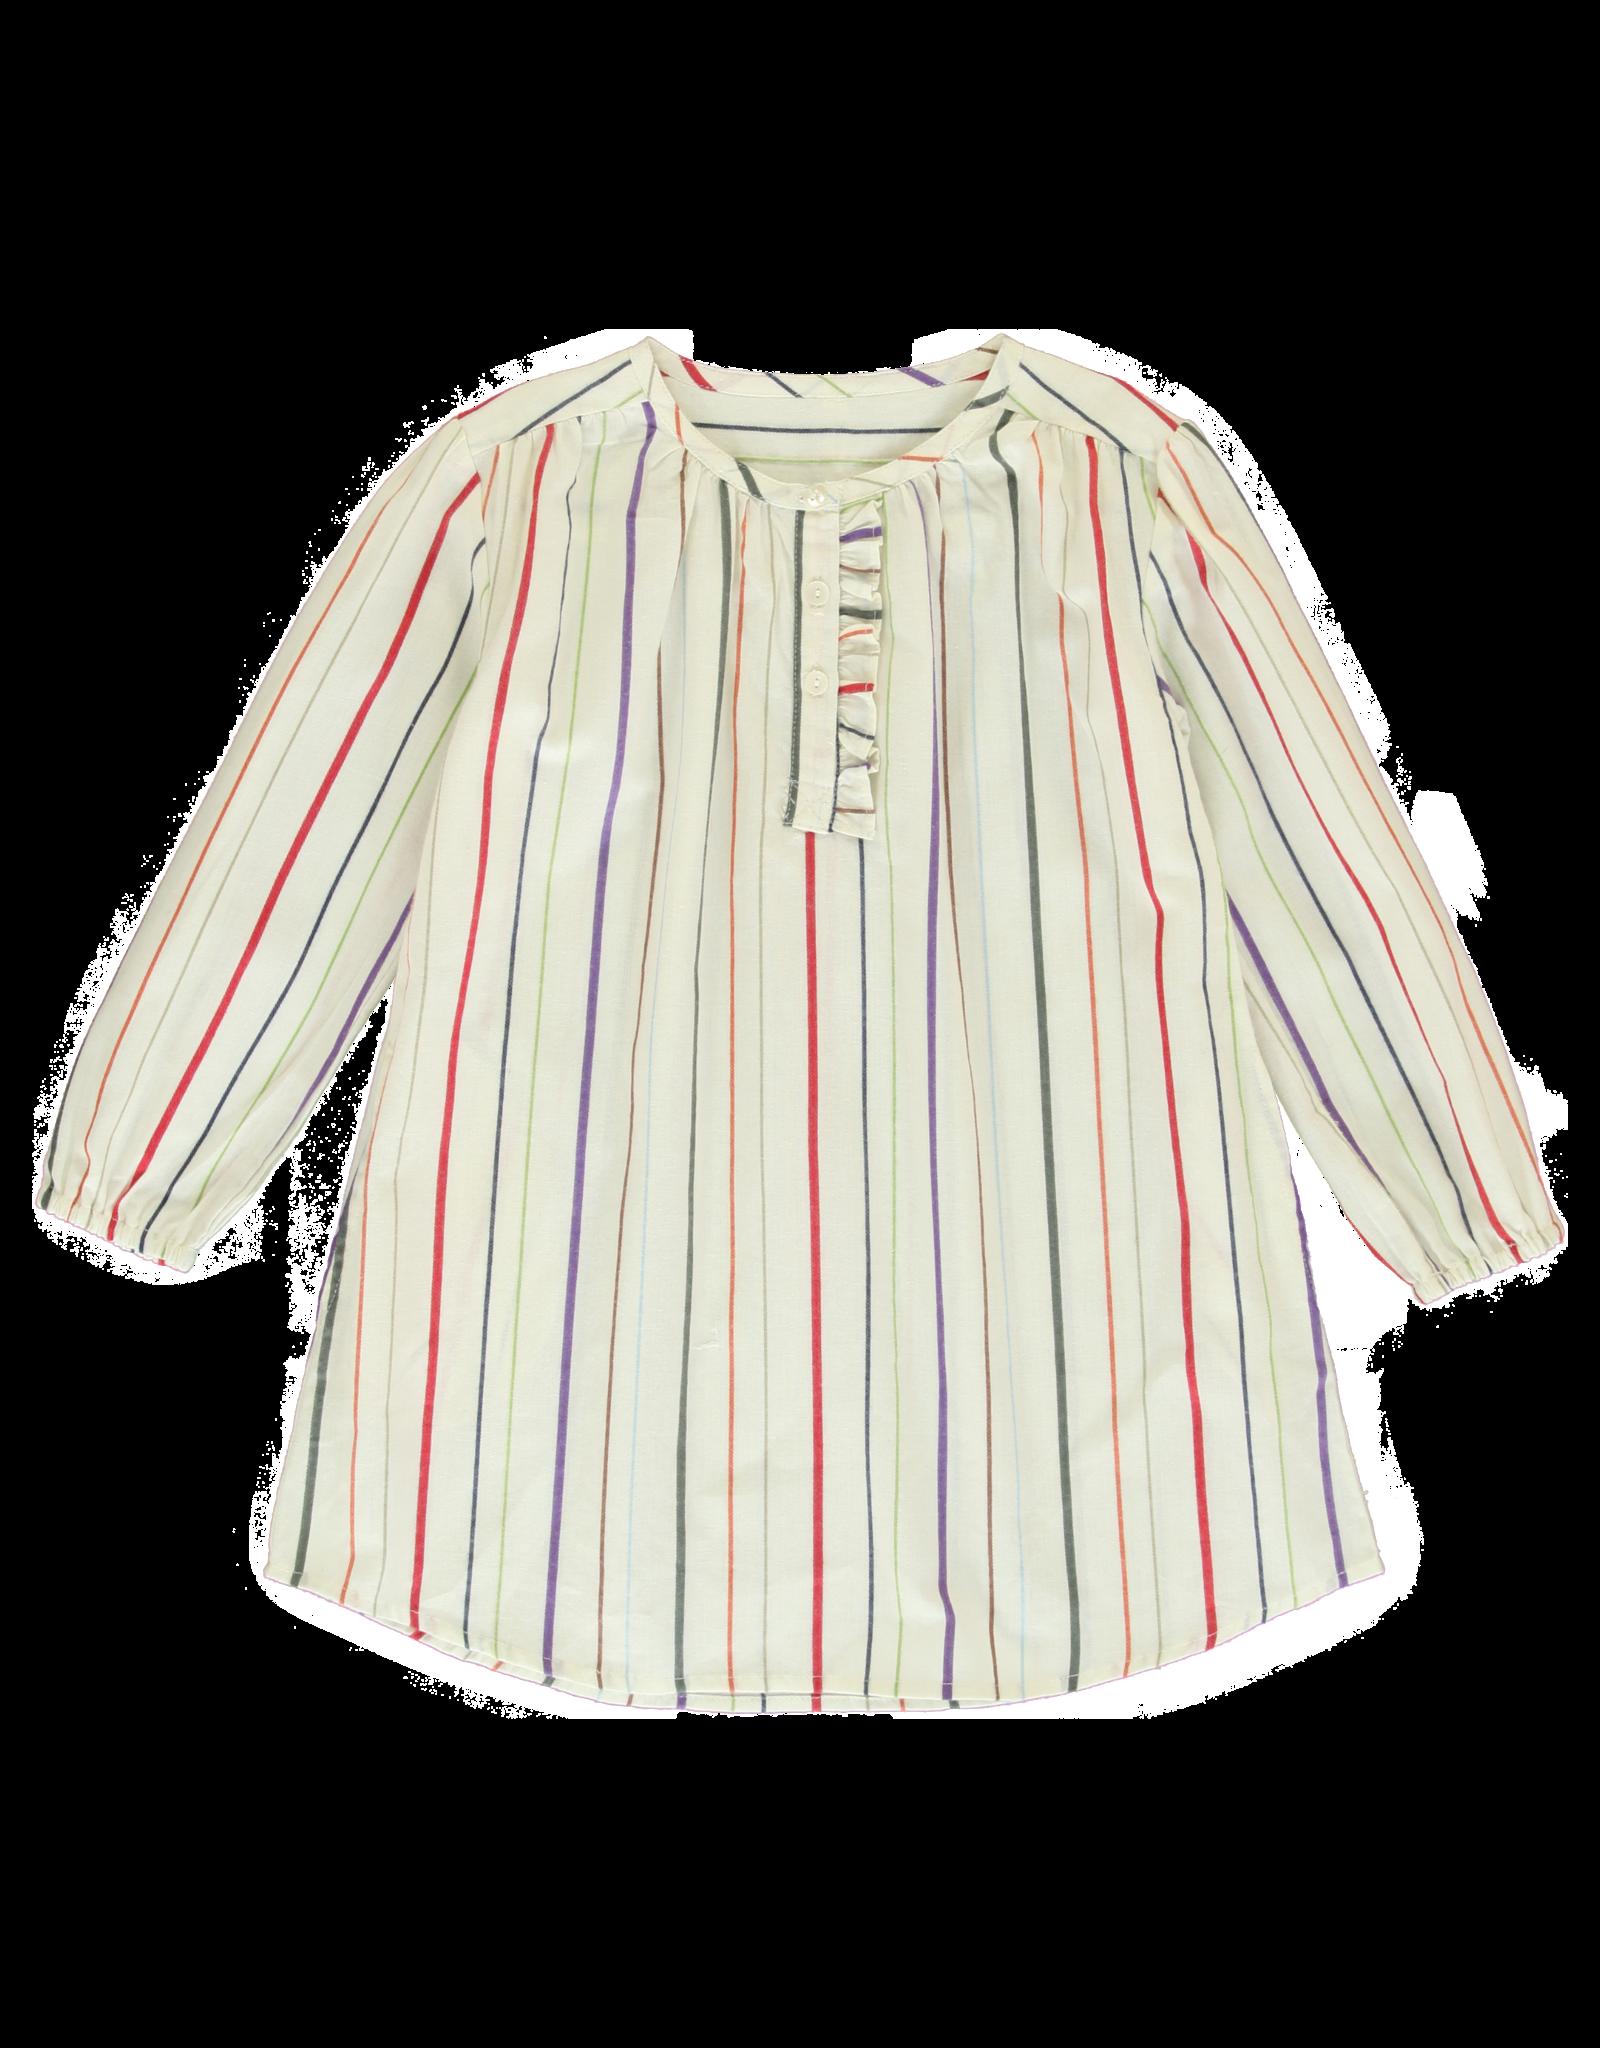 Dorélit Dora   Nightdress   Stripe Multi